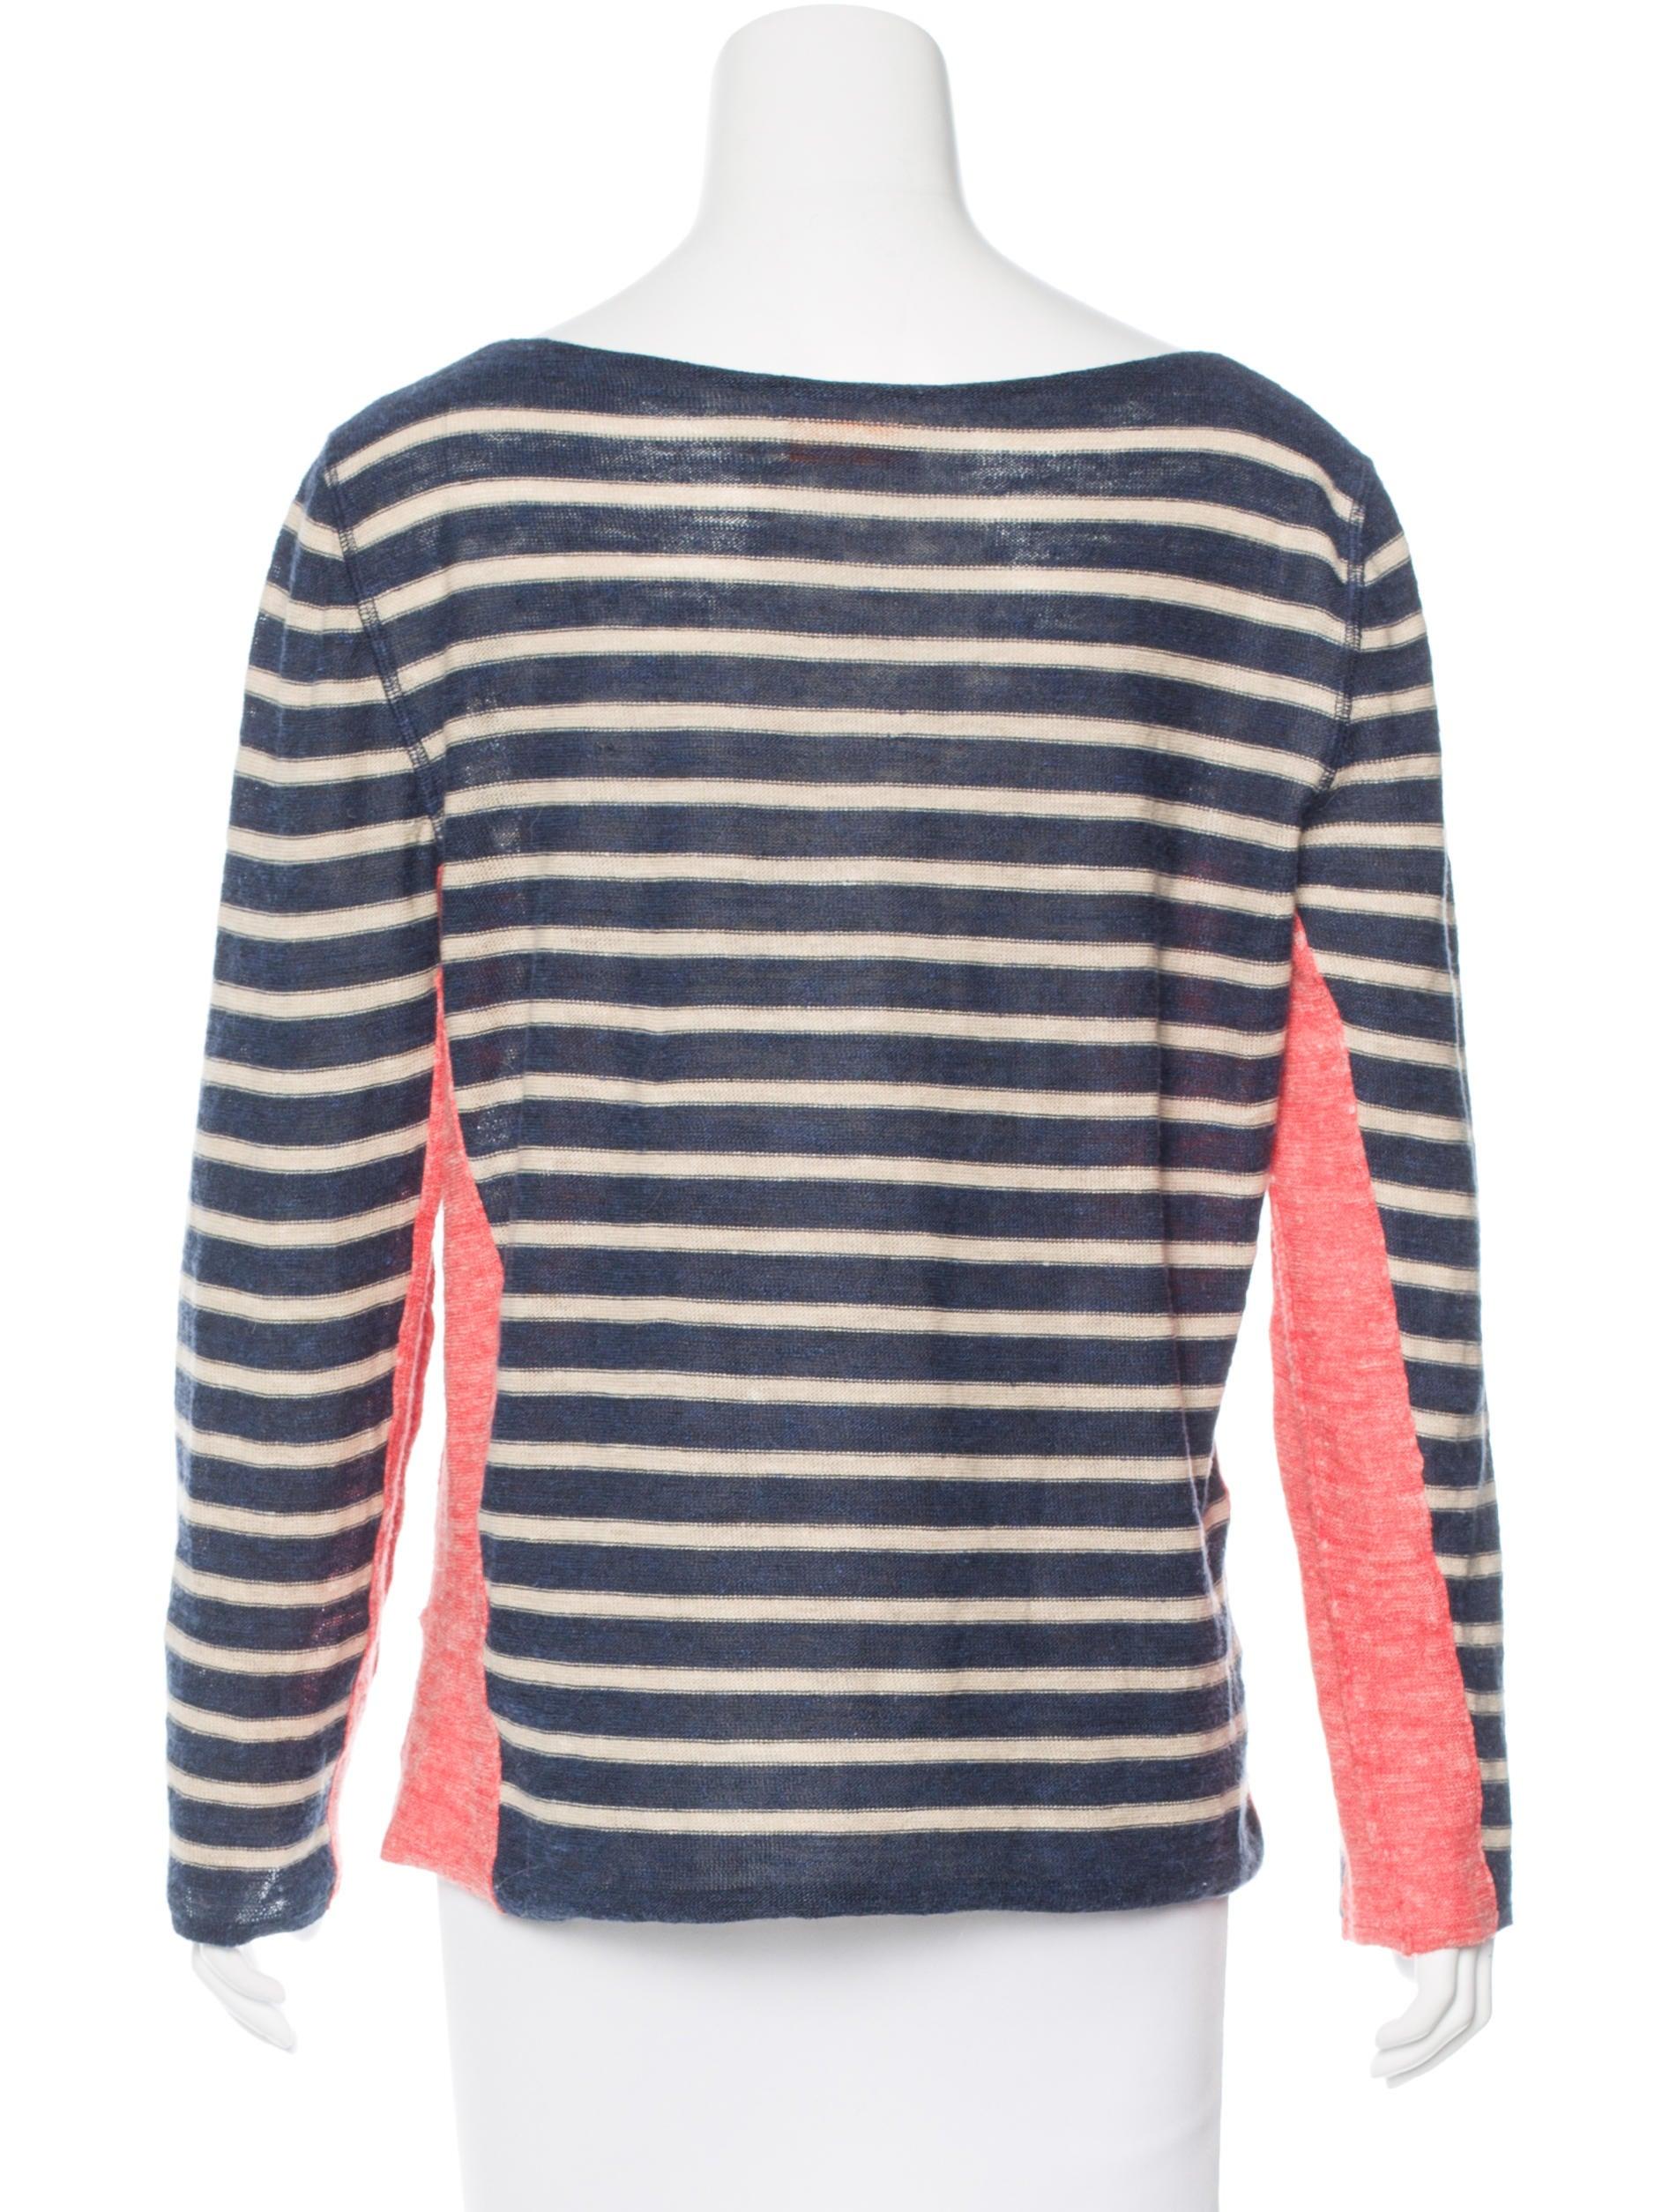 Tory burch striped long sleeve t shirt clothing for Tory burch t shirt